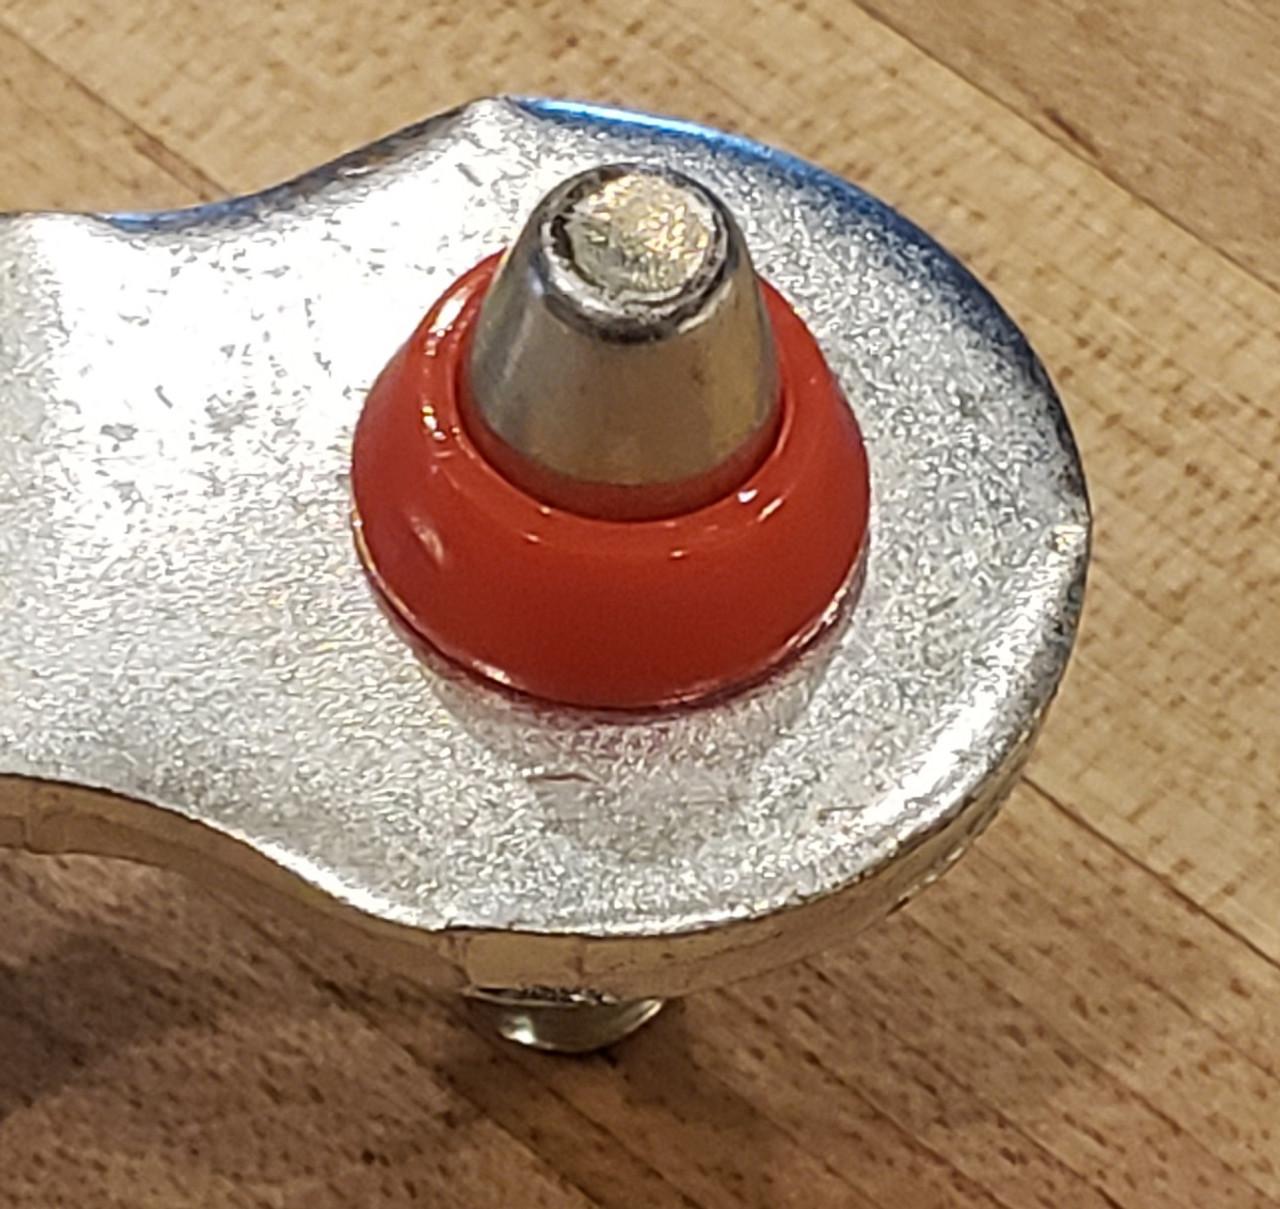 FA1KIT™ Transmission Shift Lever / Linkage Replacement Bushing Kit fits onto pin as shown.